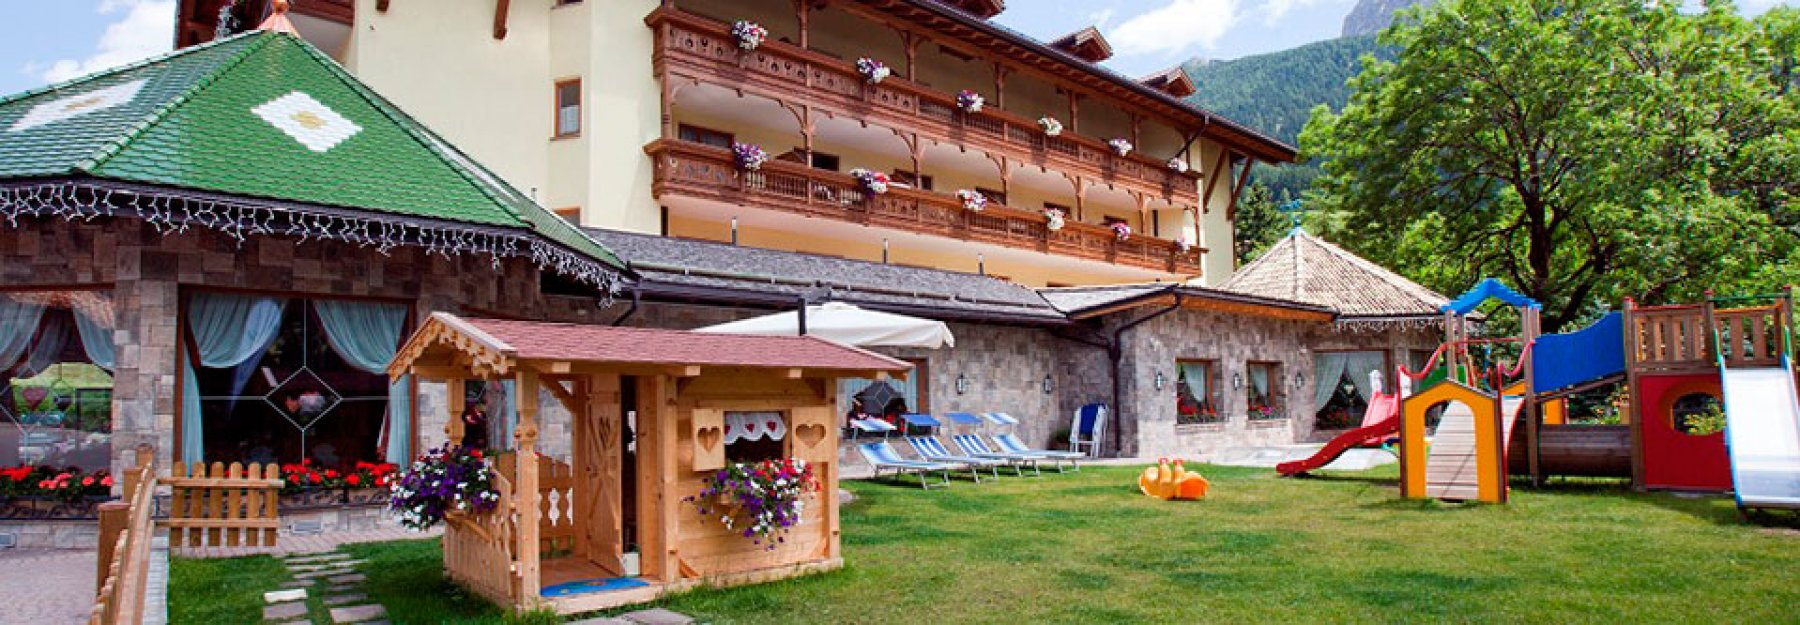 Dolce casa family hotel spa moena family hotel trentino - Hotel moena piscina ...